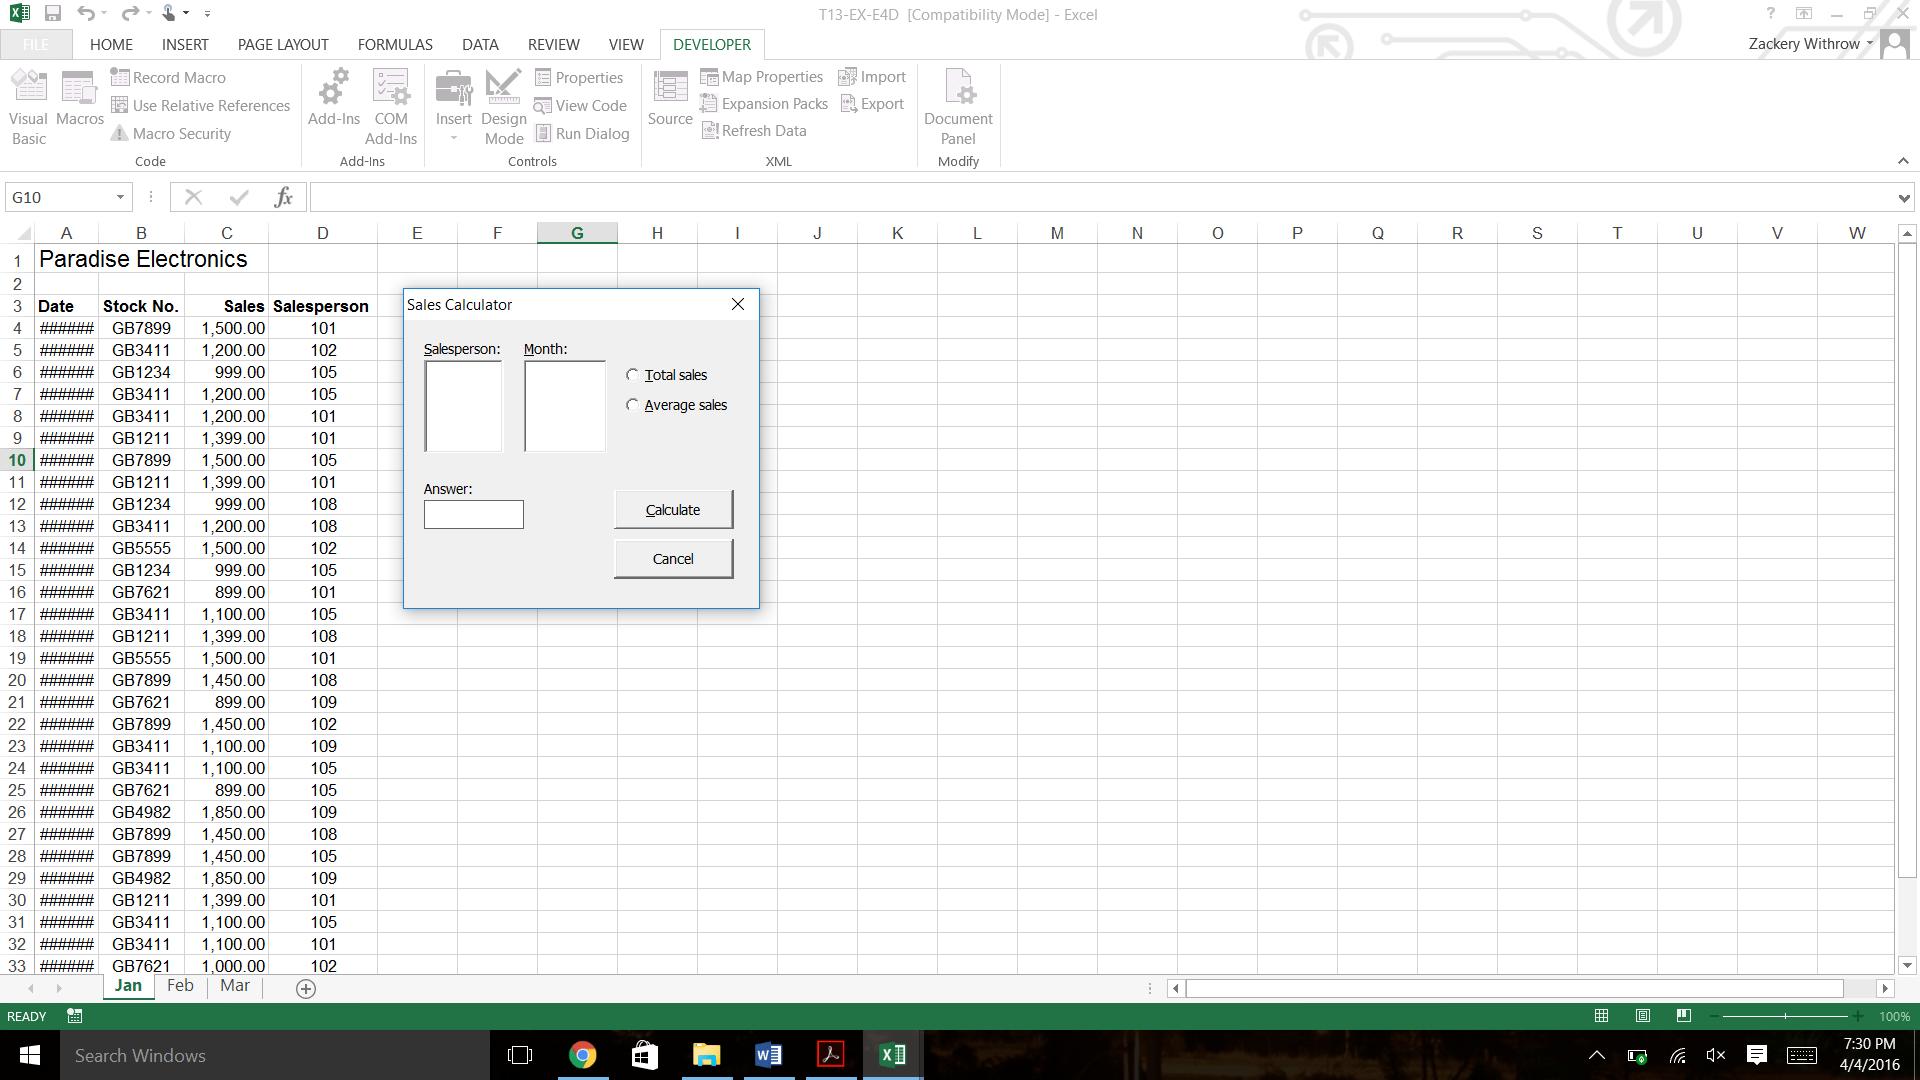 Worksheet Change In Range